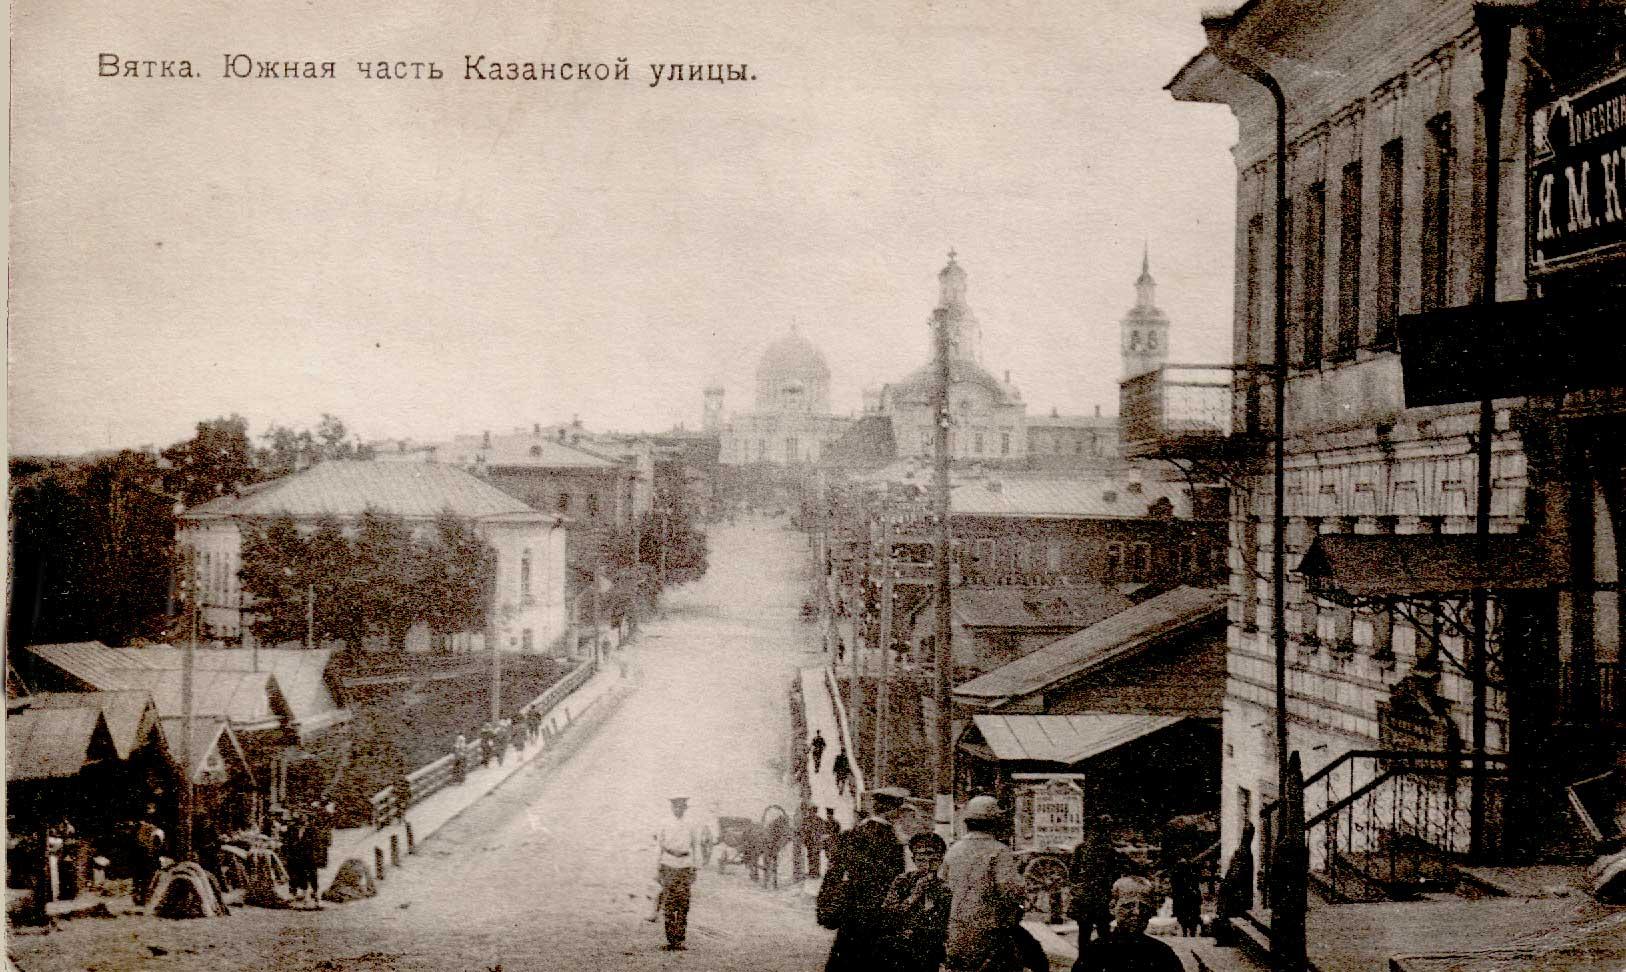 Казанская улица. Южная часть